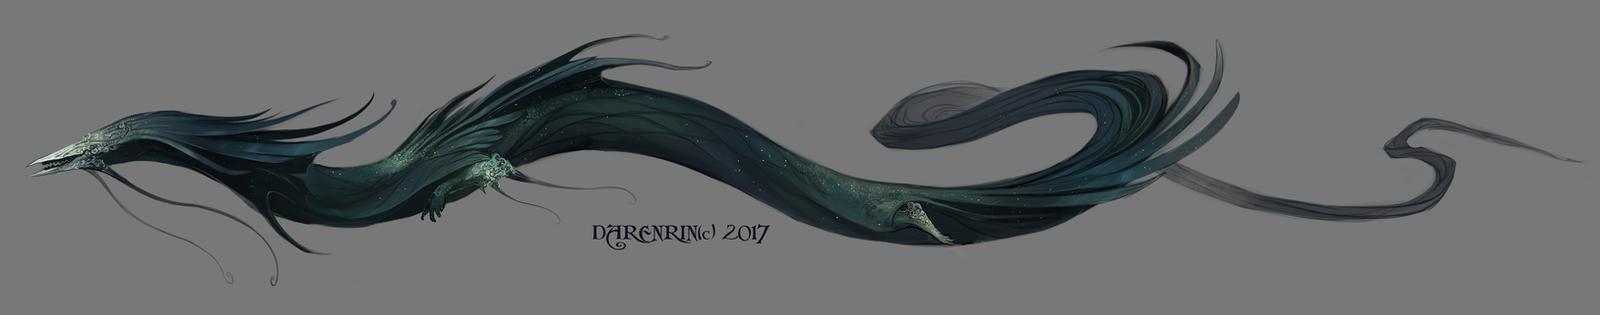 worm by Darenrin